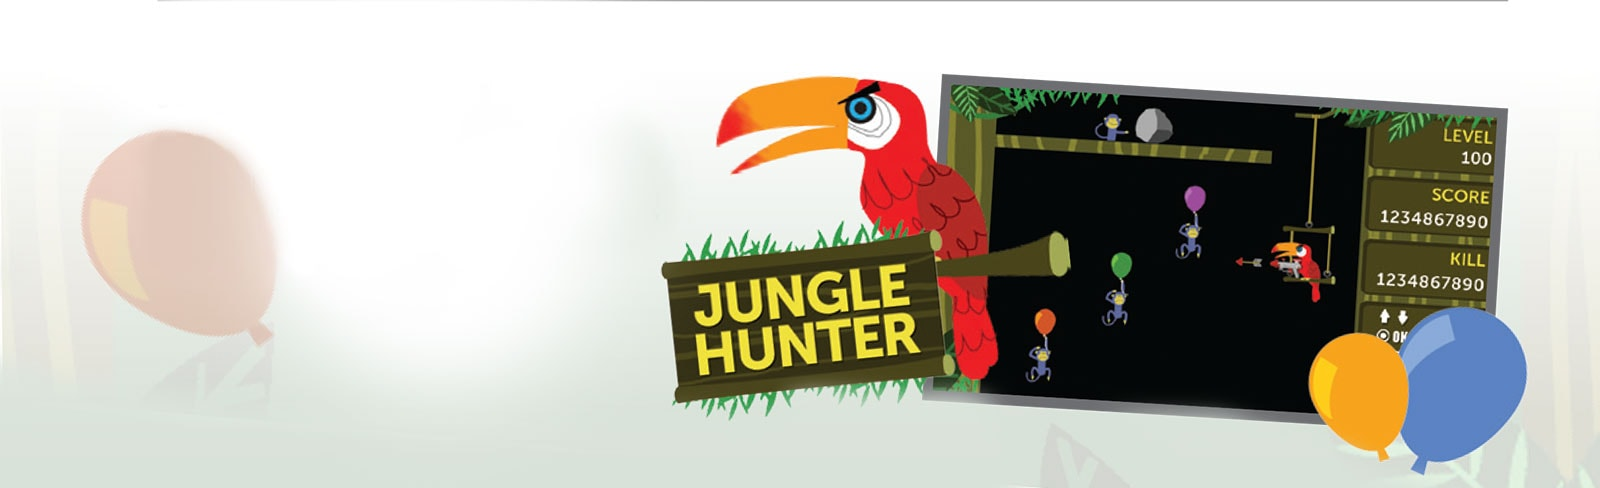 Jungle-Hunter%20-%20Copy